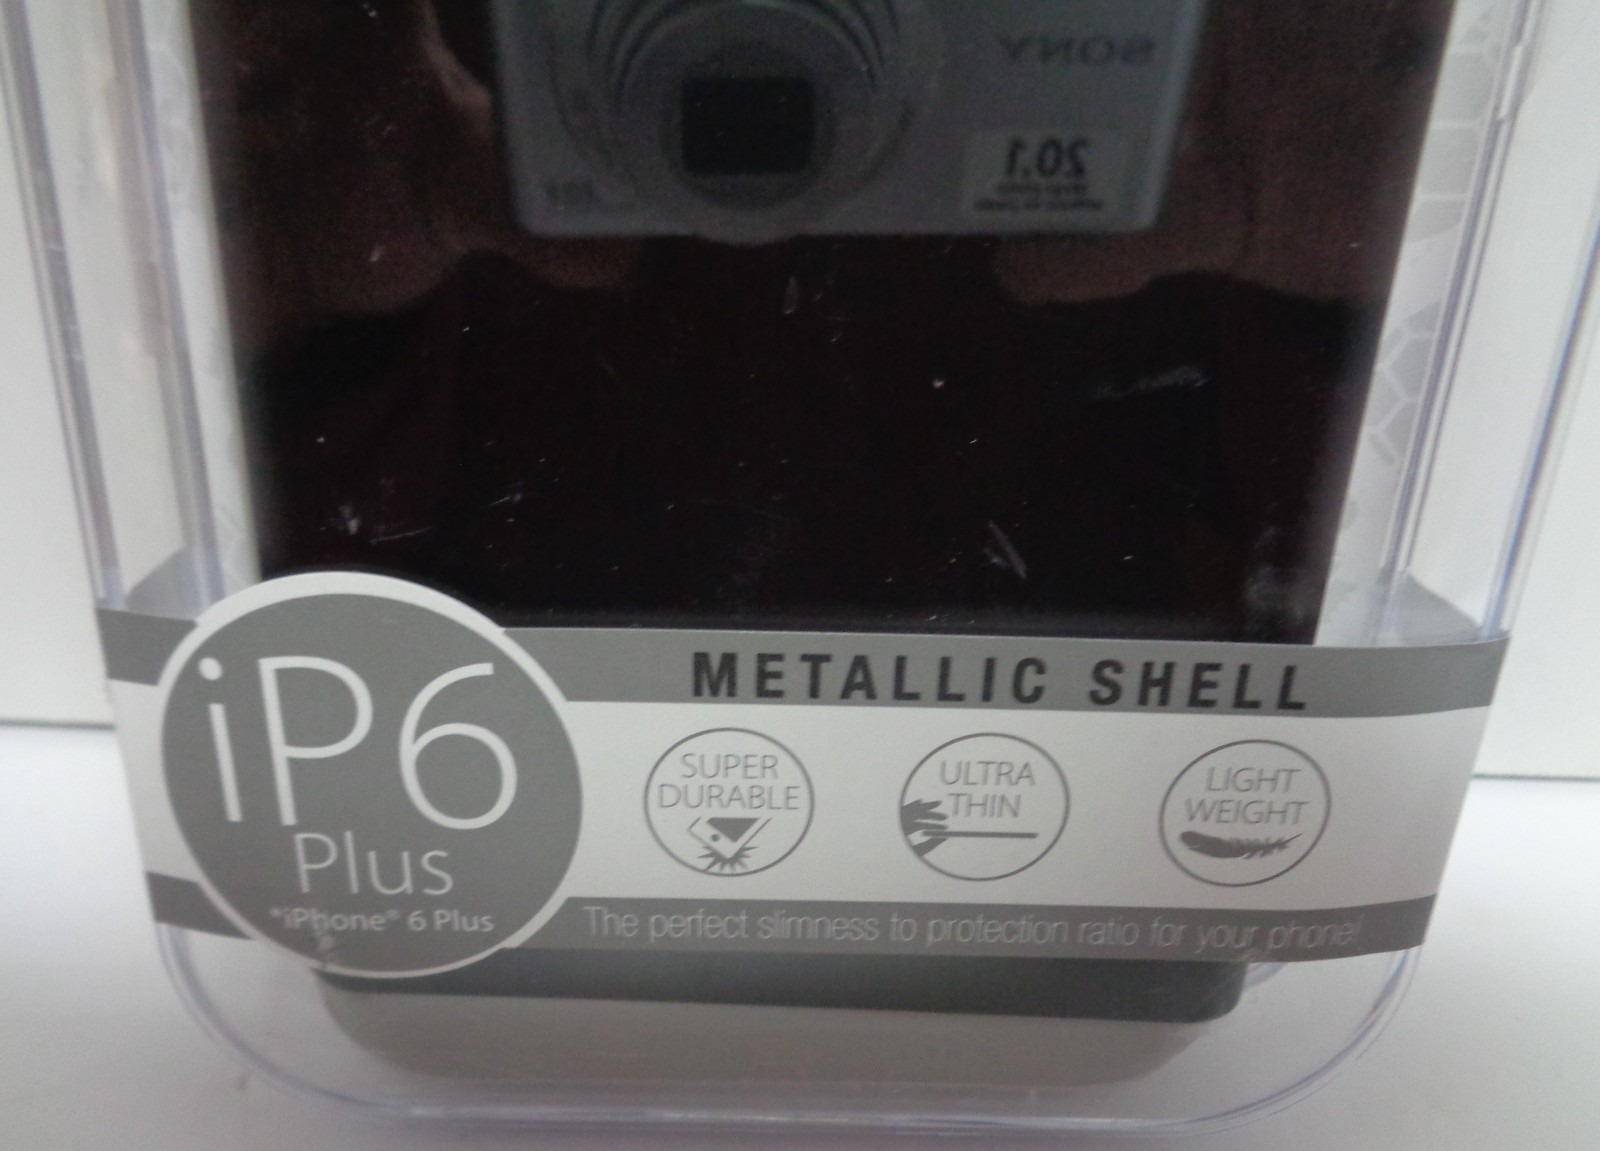 IPhone 6 Plus Black Cell Phone Case Metallic Shell NIB